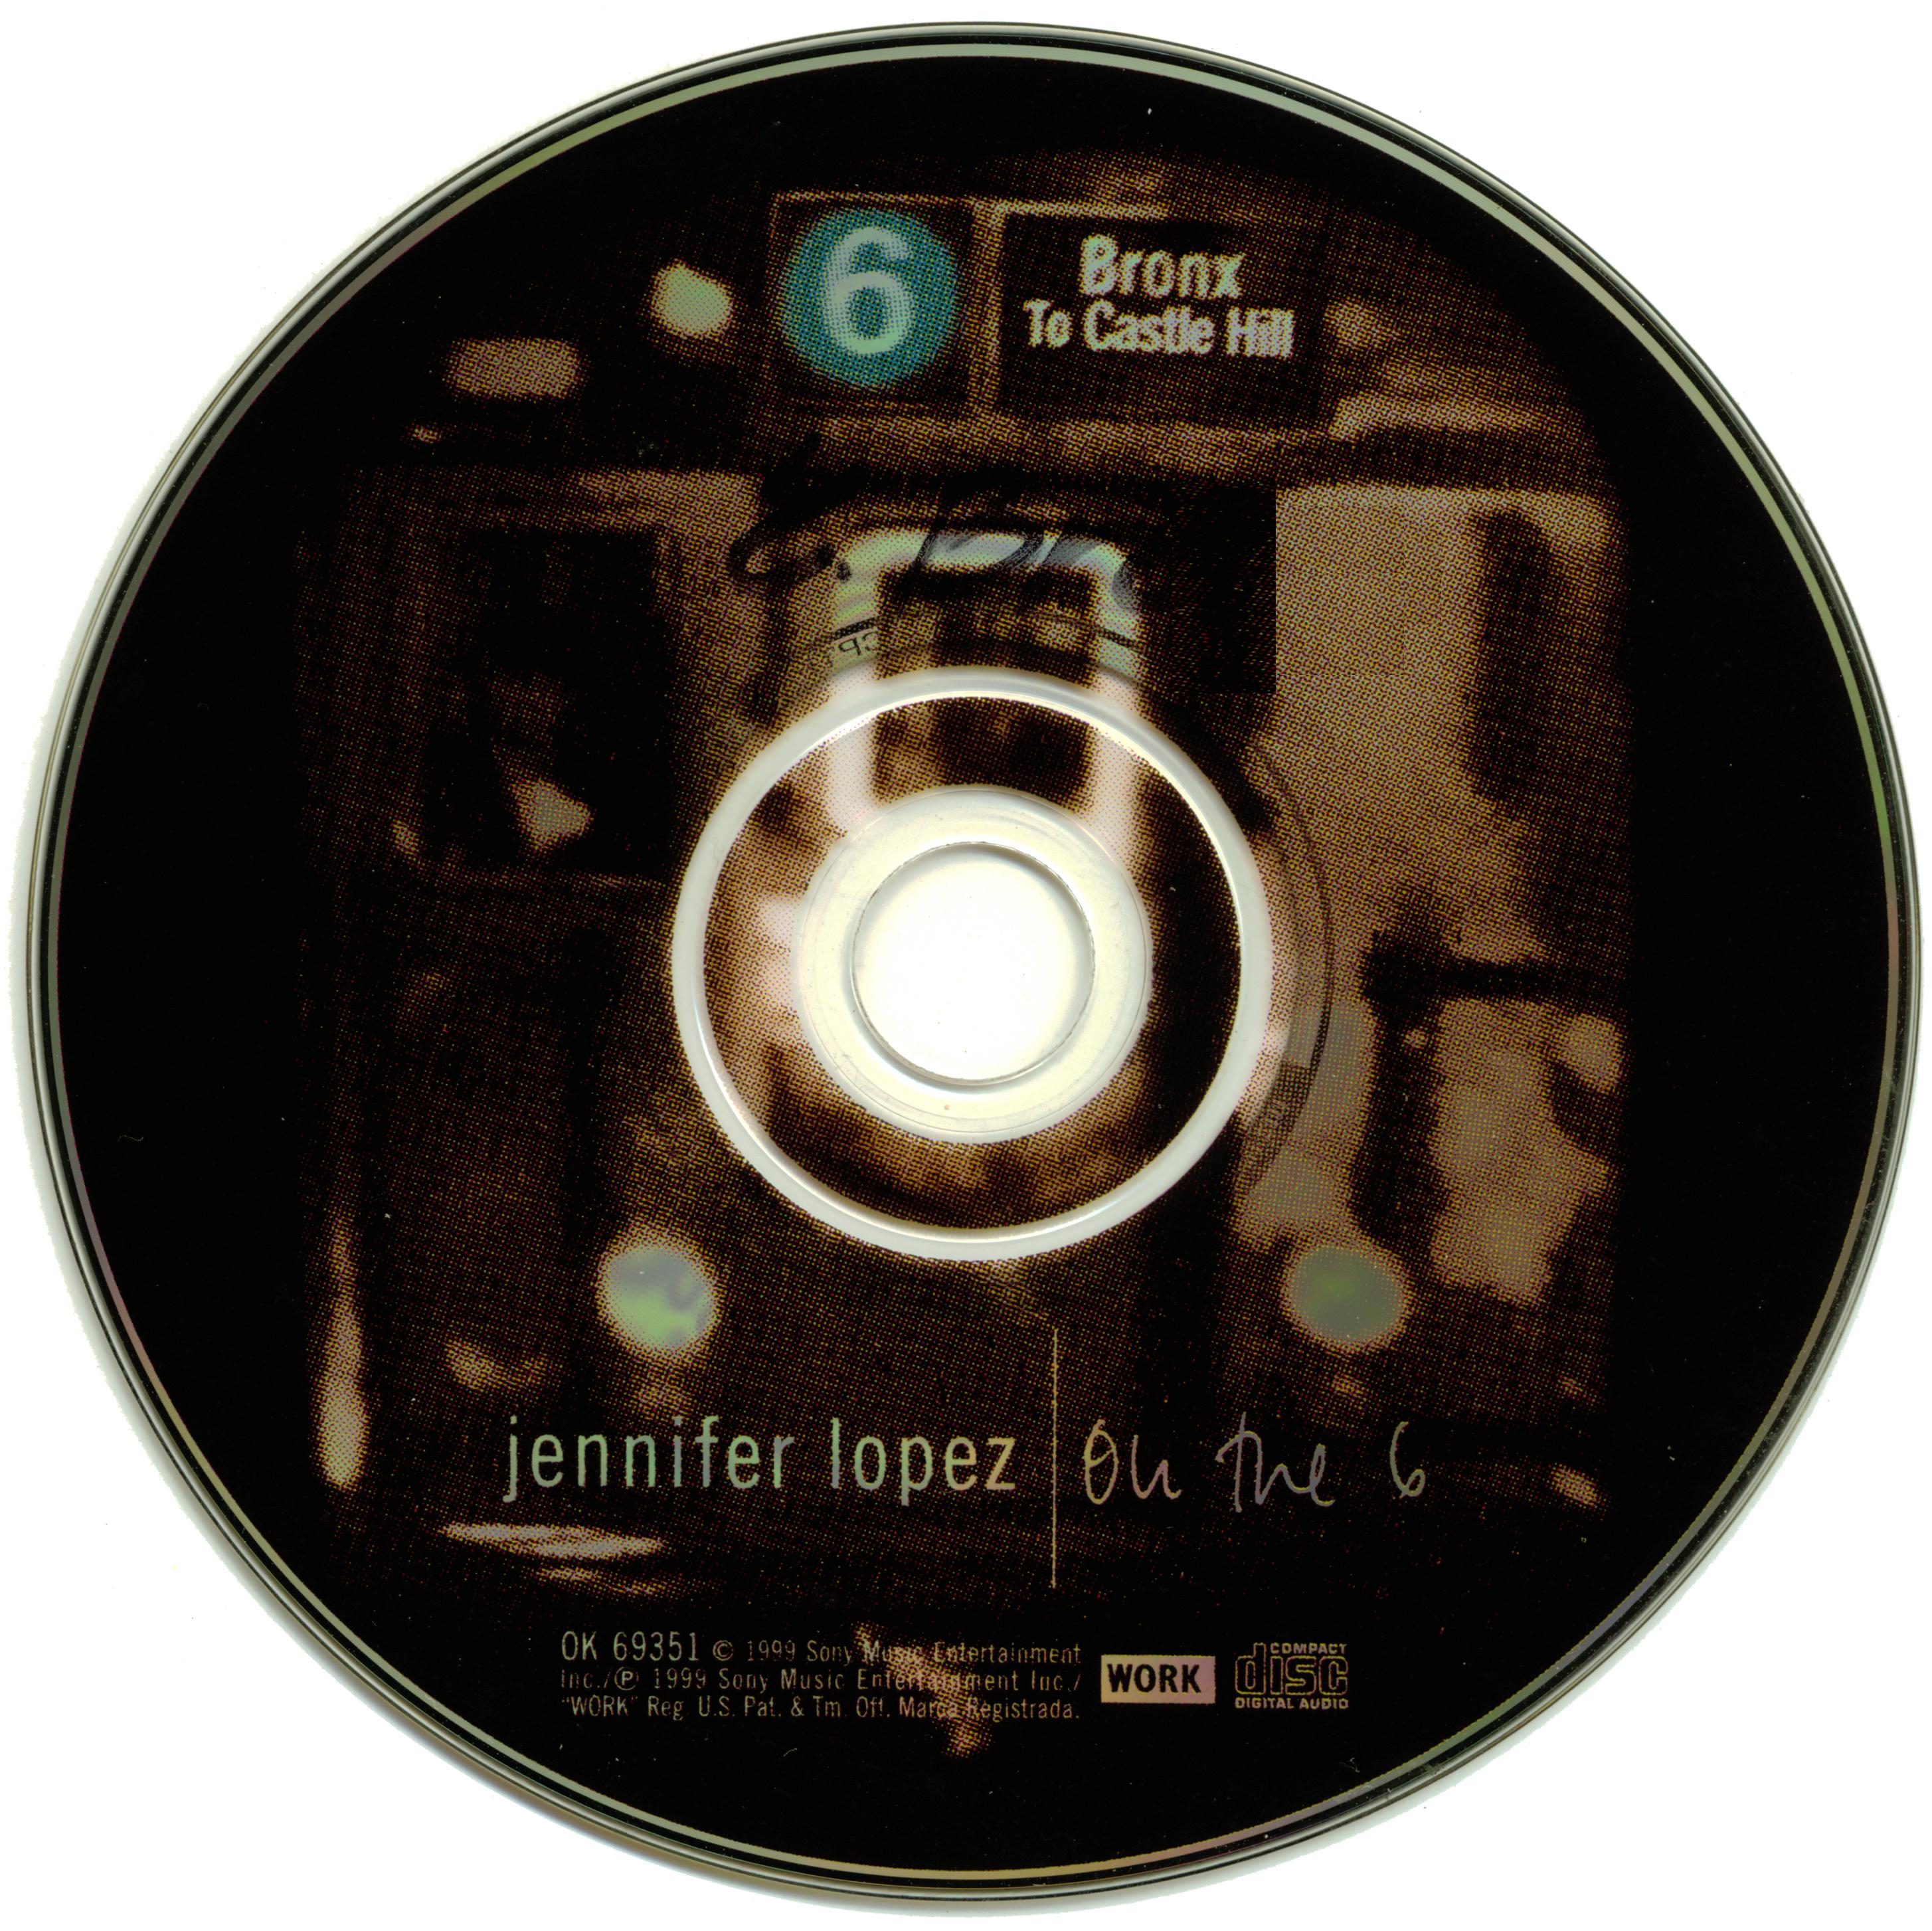 Jennifer Lopez On the 6 Album